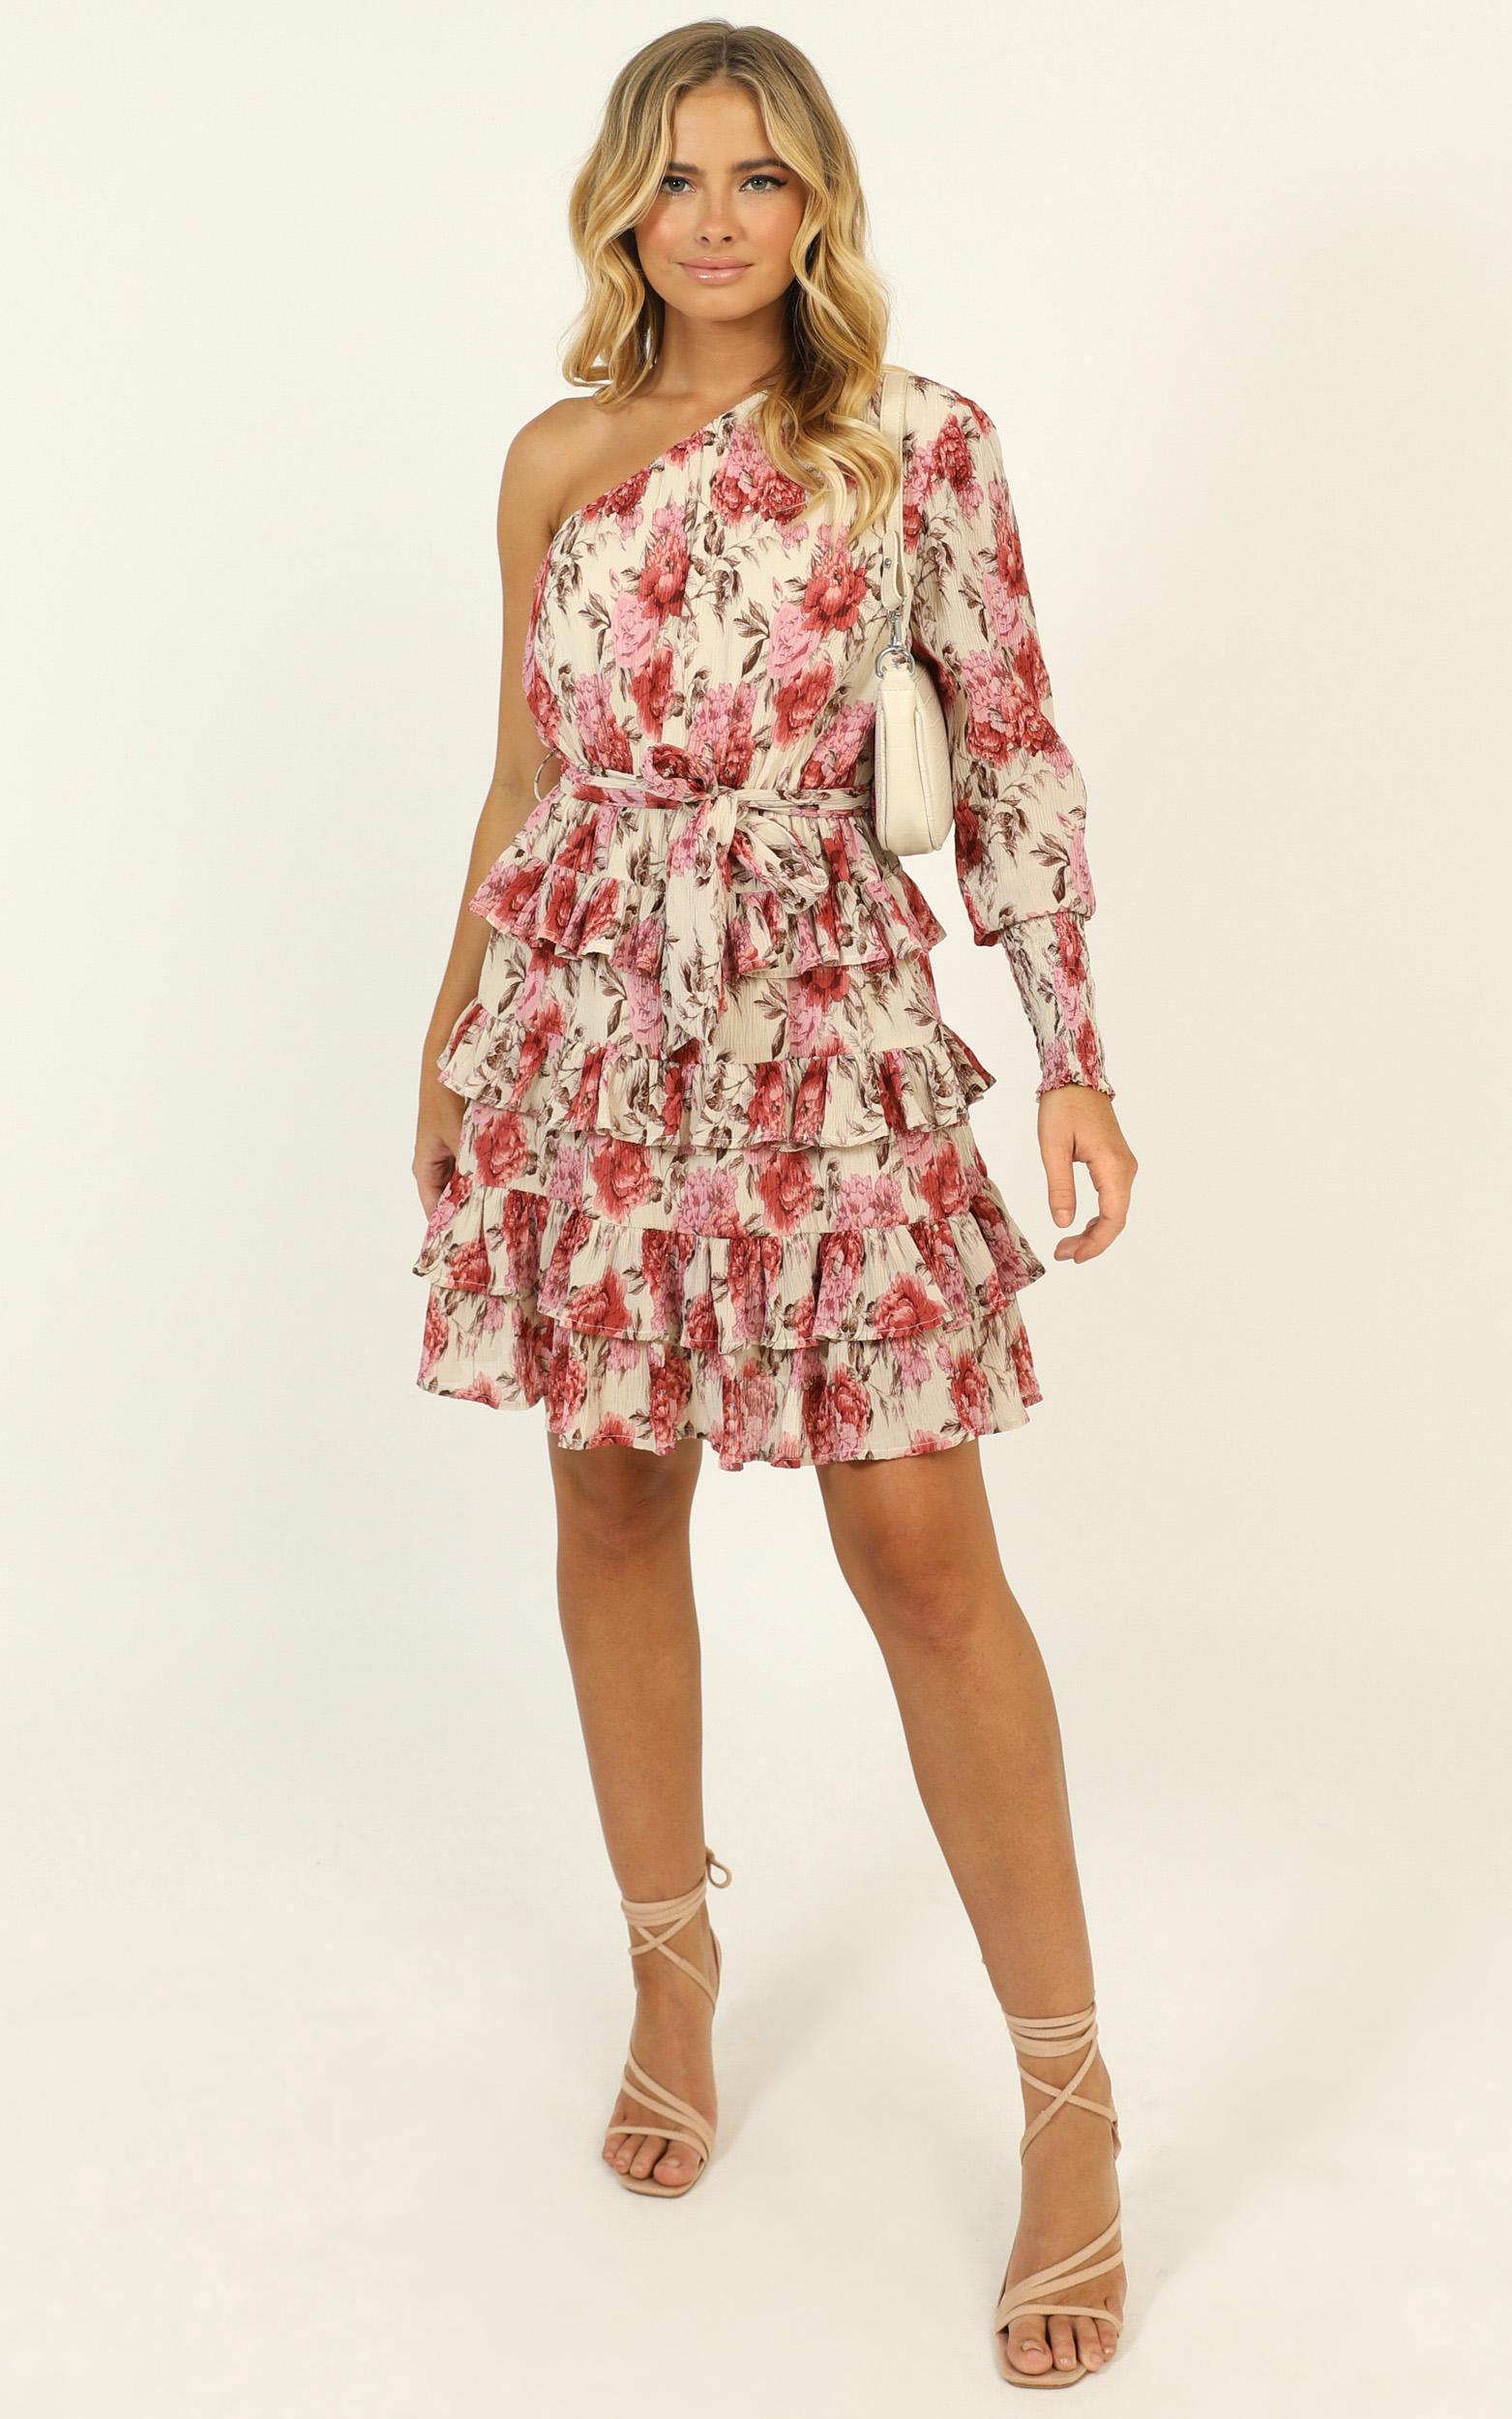 Mckenzie Mini Dress in rose floral - 14 (XL), Pink, hi-res image number null